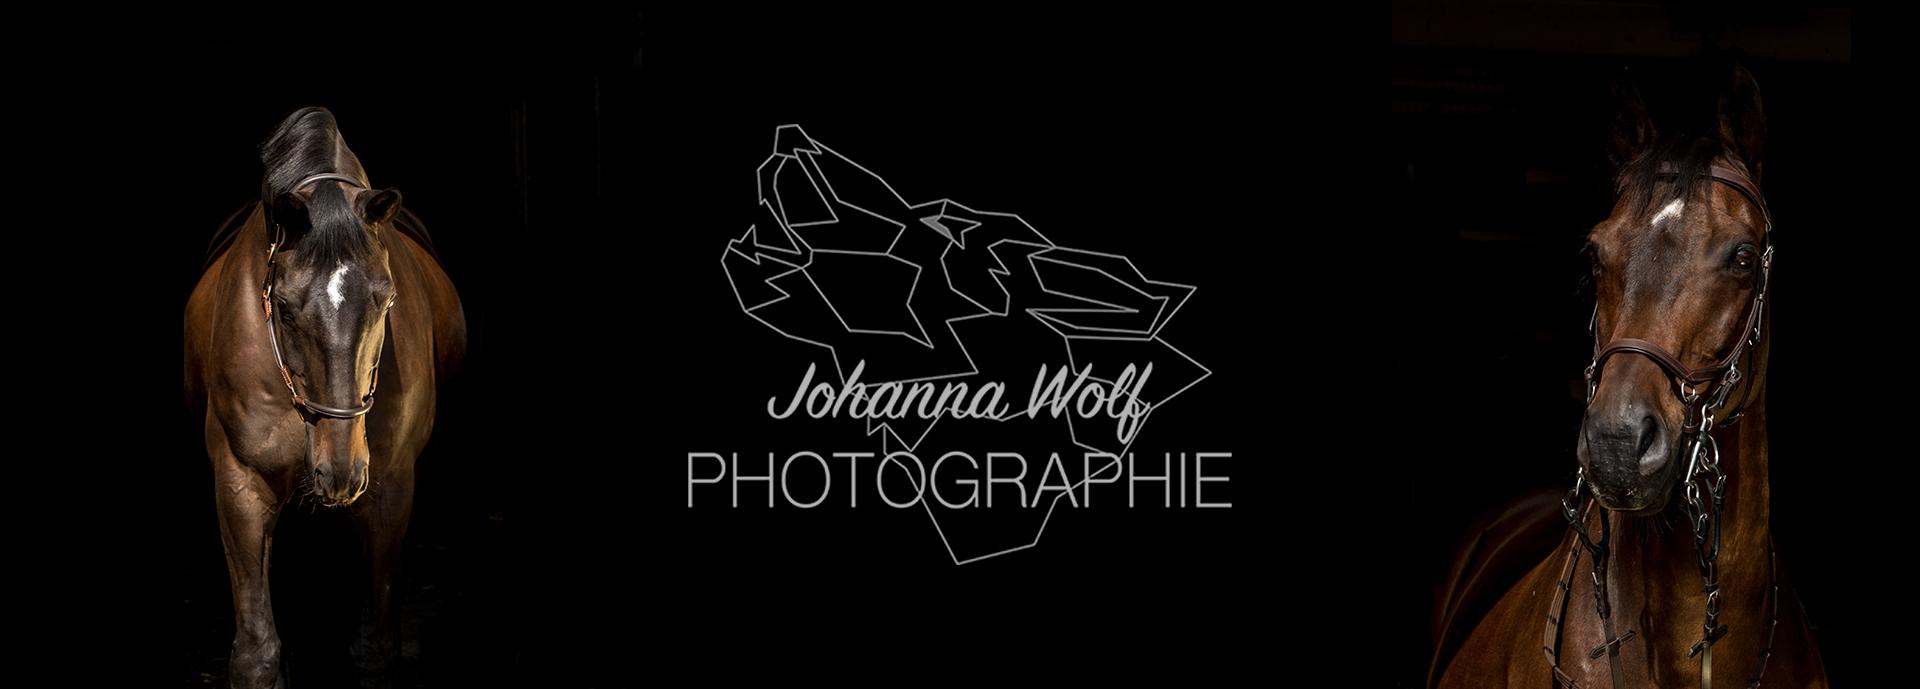 Johanna Wolf Photographie